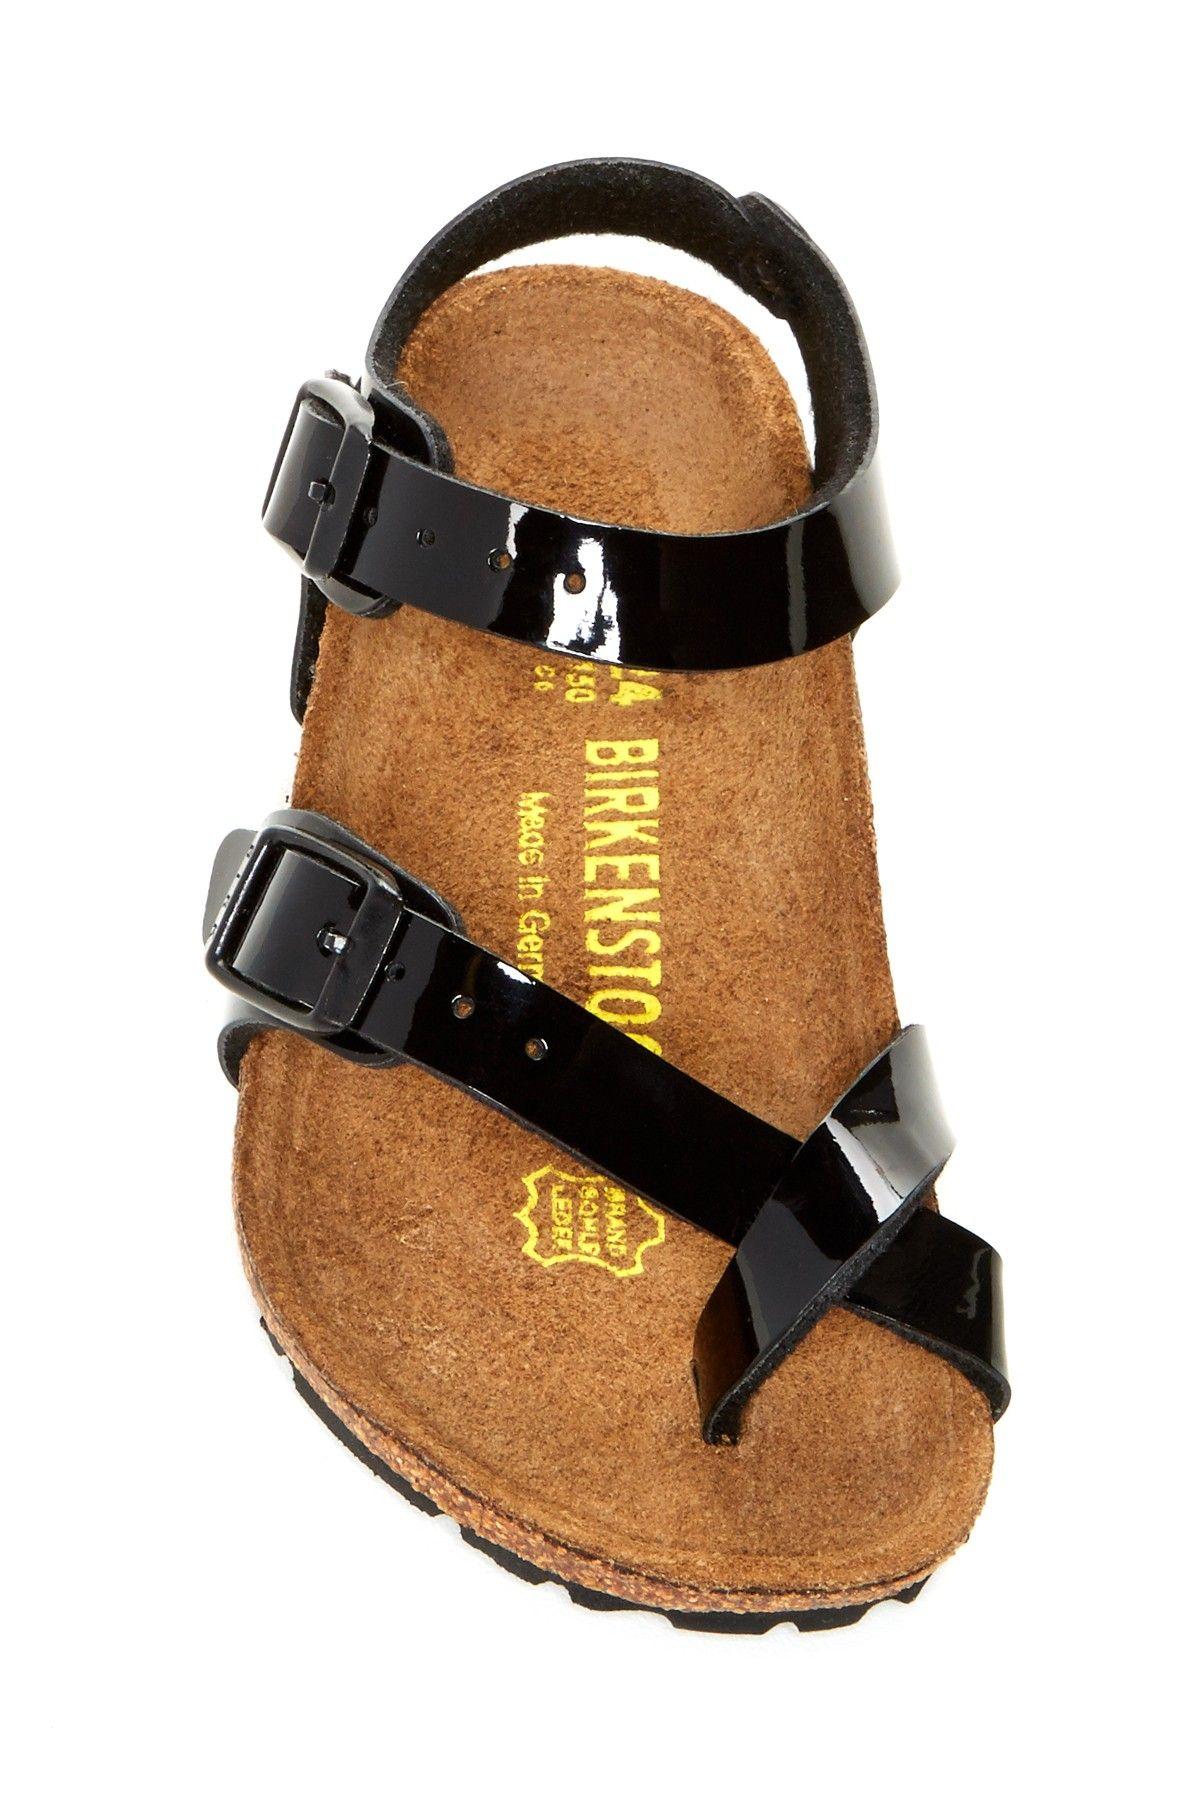 65c432156bb Birkenstock Taormina Sandal (Toddler   Little Kid) by Birkenstock on   HauteLook